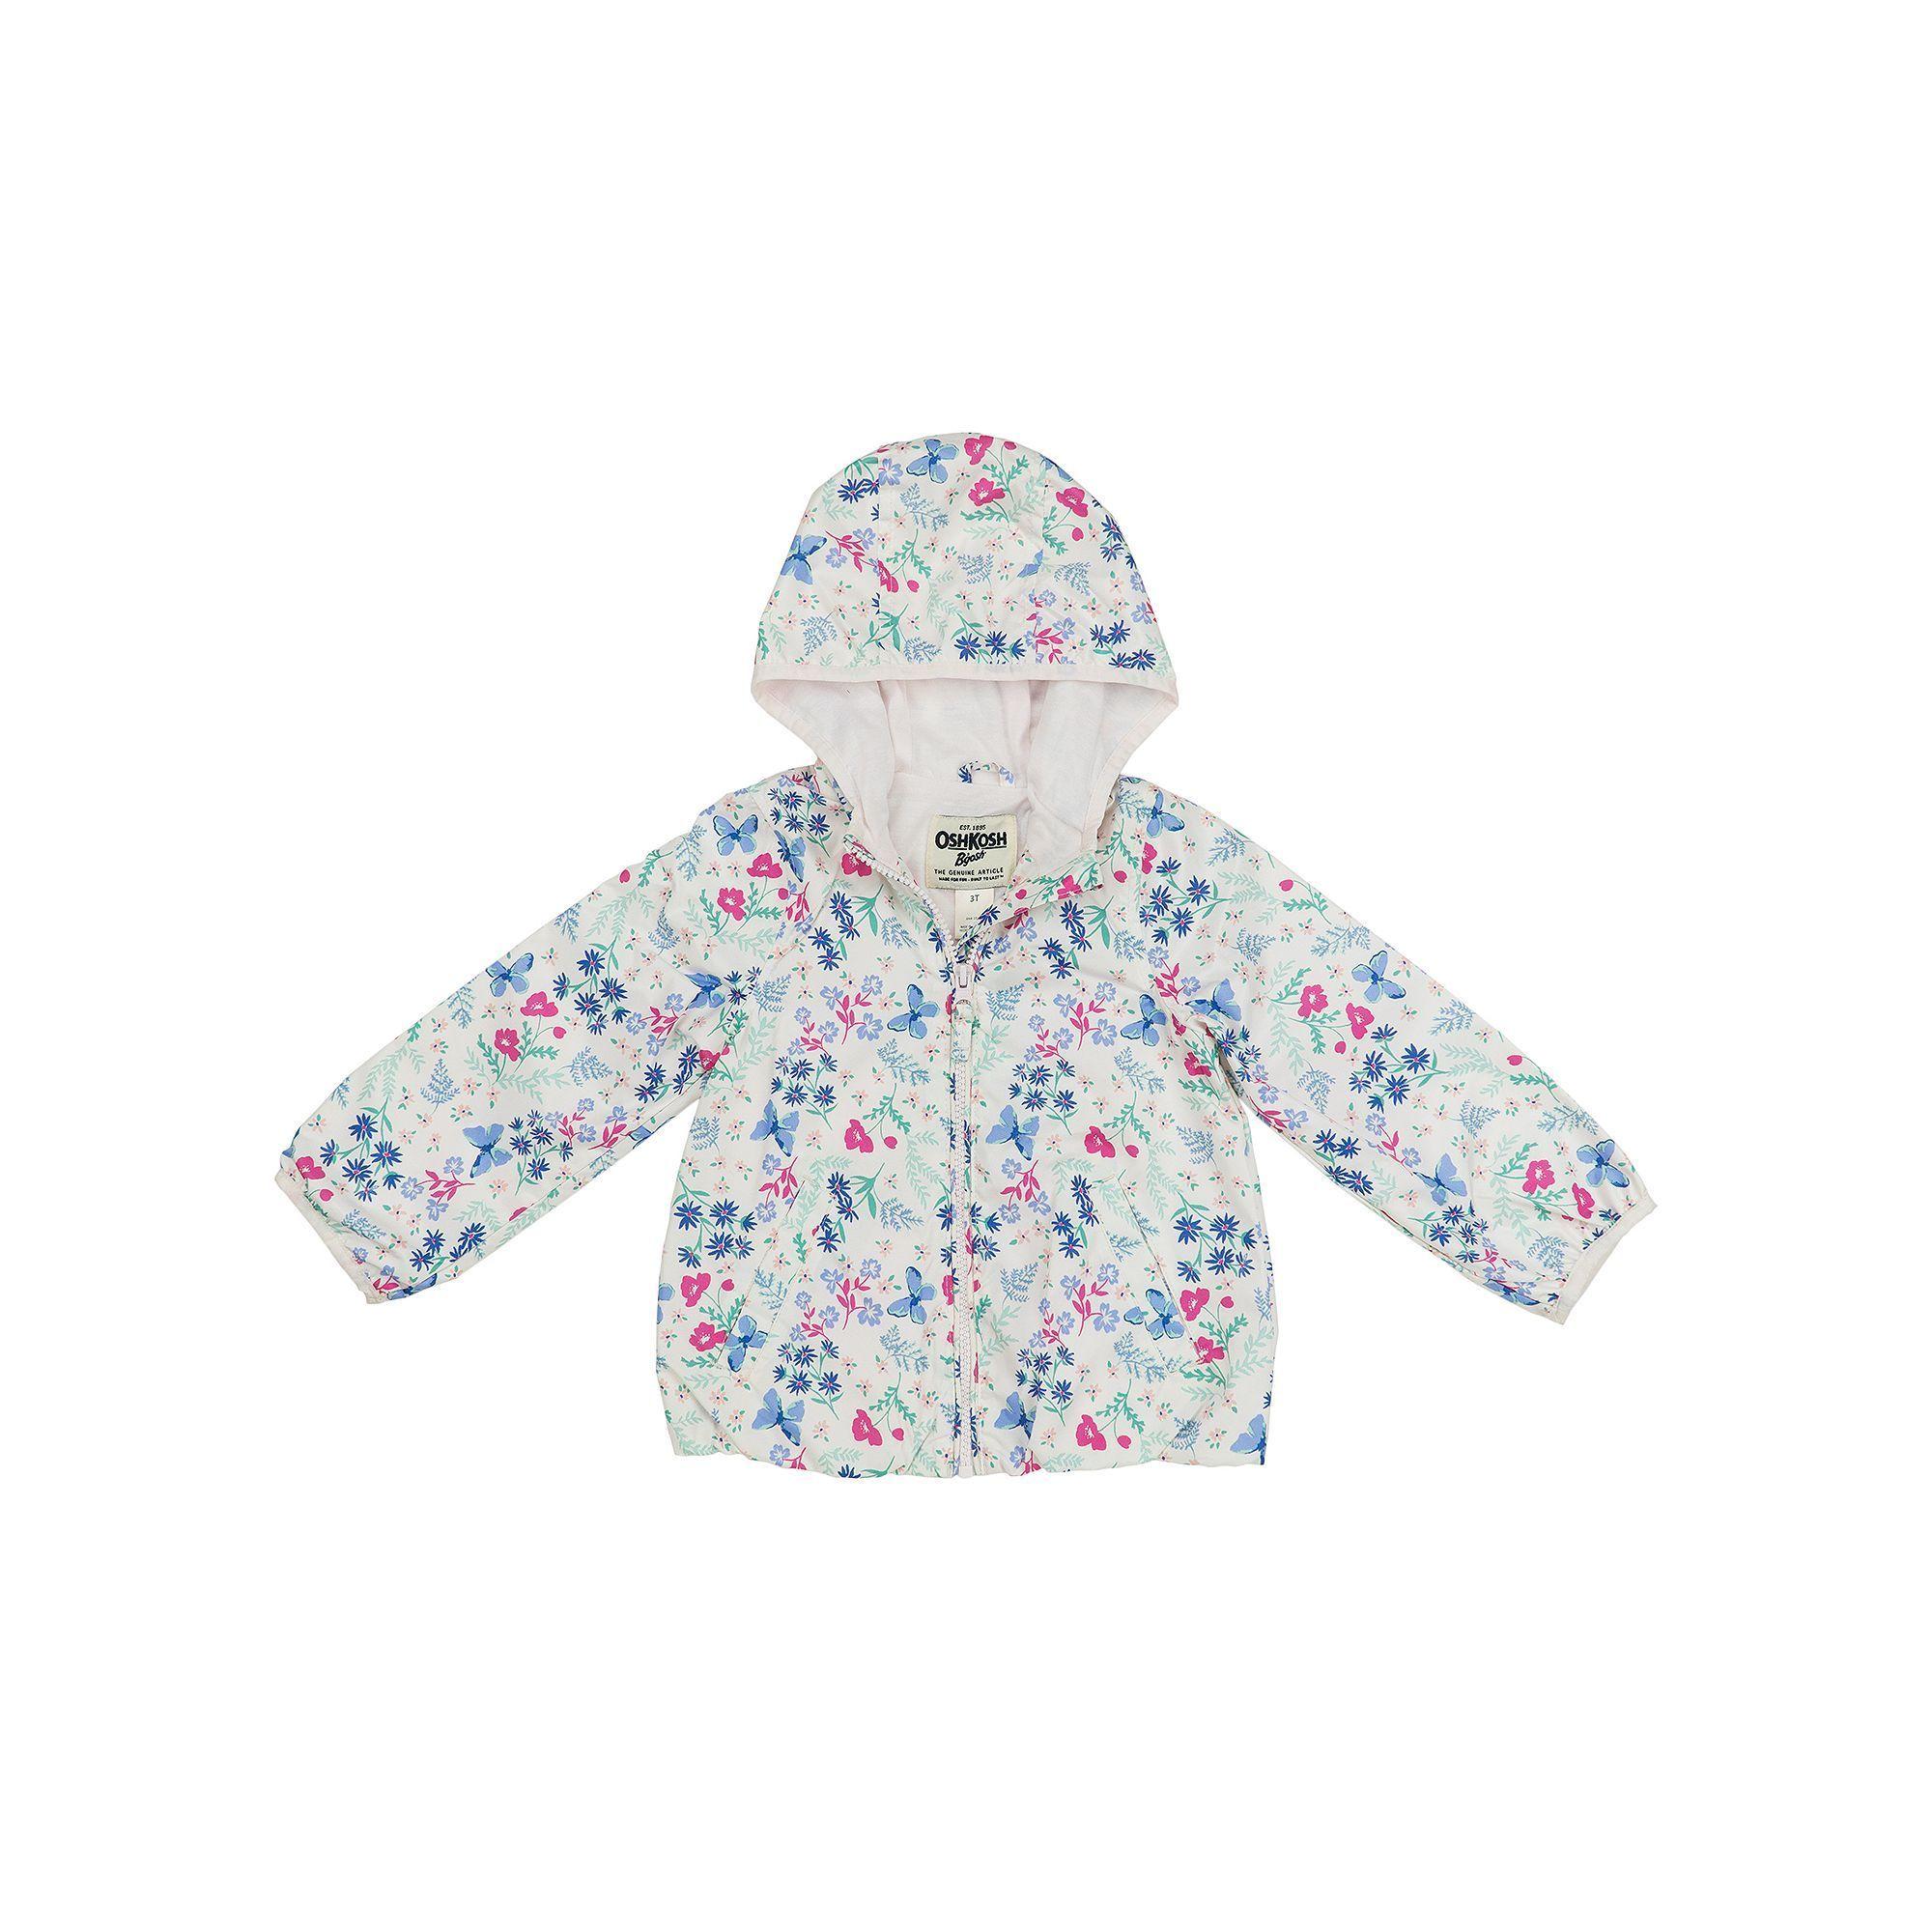 ff9b5e051eac Toddler Girl OshKosh B gosh® Lightweight Floral Jacket